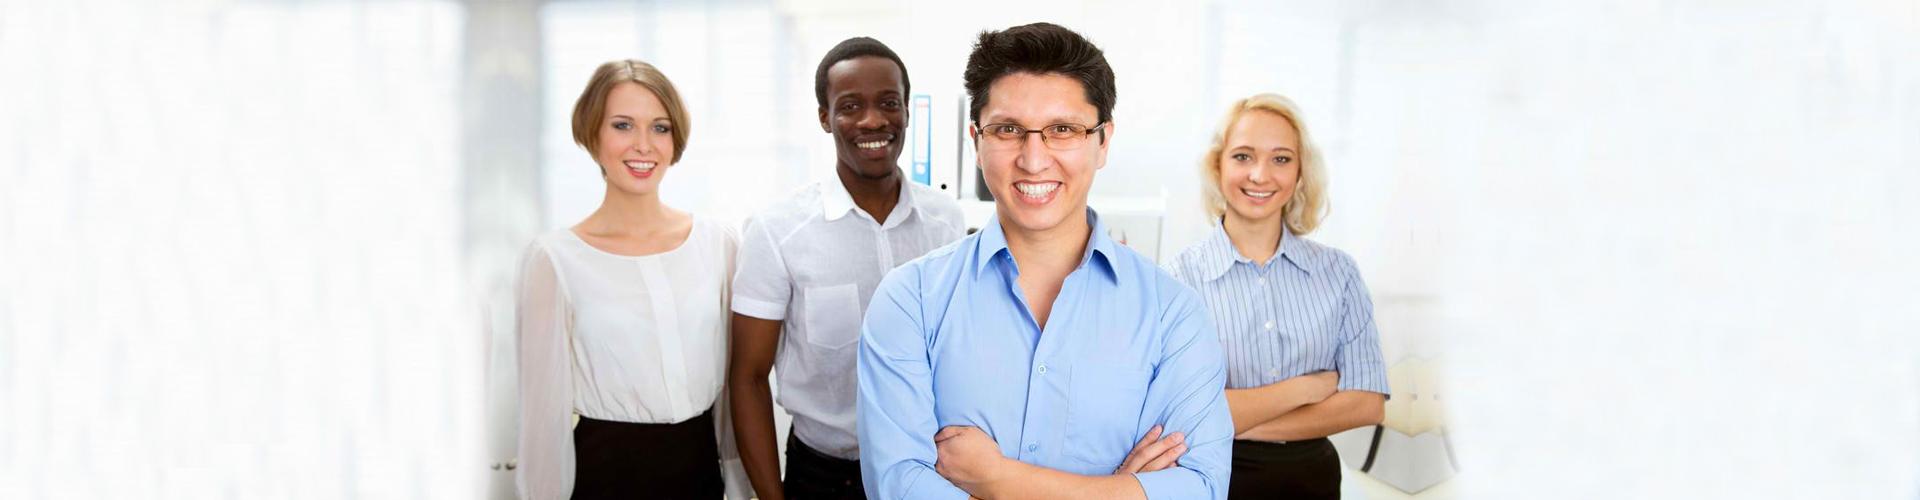 IT professionals smiling